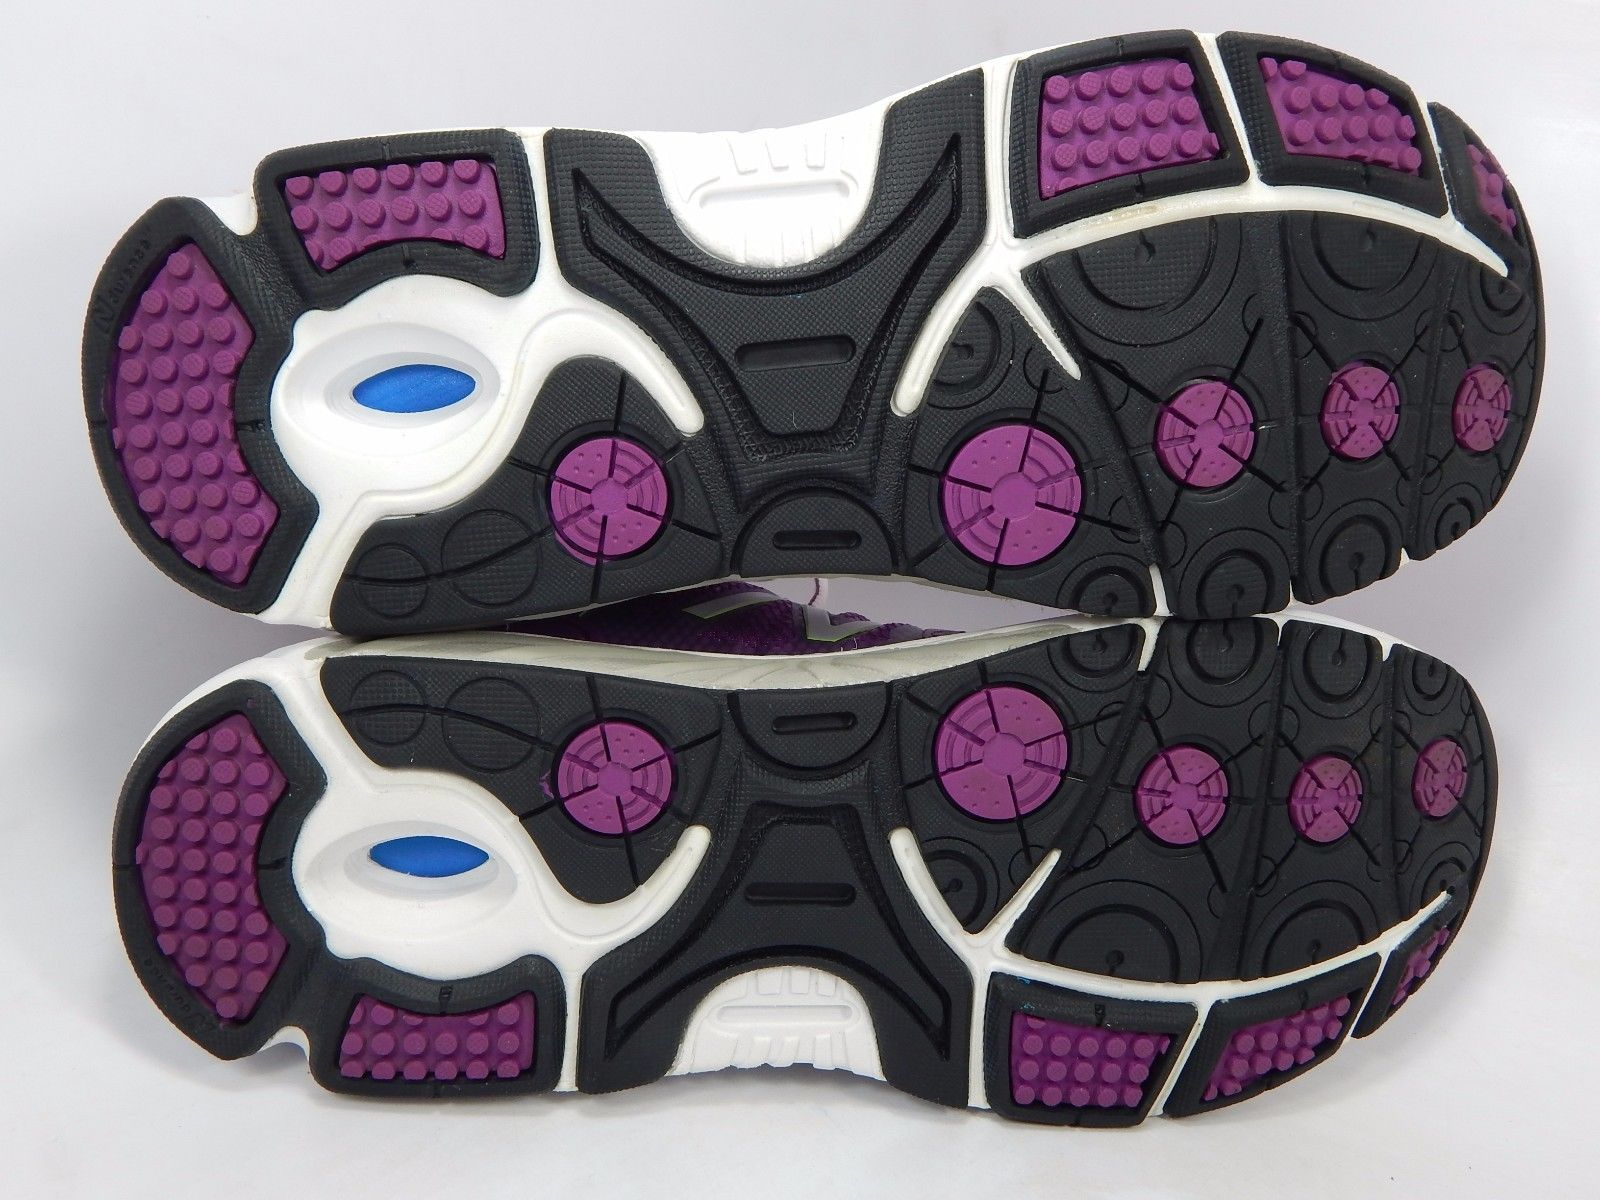 New Balance 3040 Women's Running Shoes Size US 10 M (B) EU 41.5 Purple W3040PP1